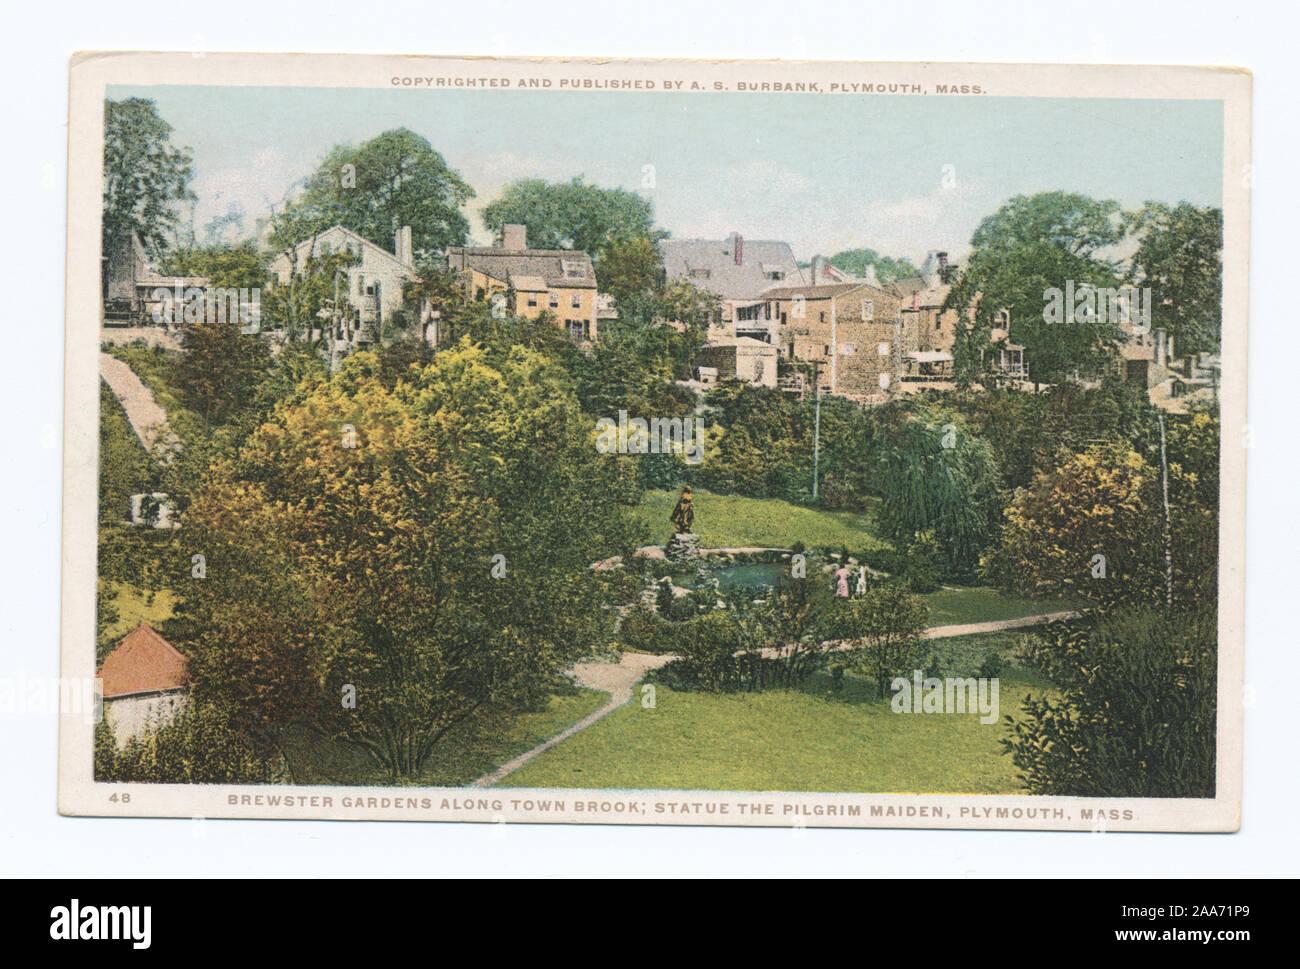 Brewster Gardens Along Town Brook; Statue The Pilglim Maiden, Plymouth, Mass.; Brewster Gardens Along Town Brook; Statue: The Pilgrim Maiden, Plymouth, Mass.  Sculptor: Henry Hudson Kitson. Stock Photo